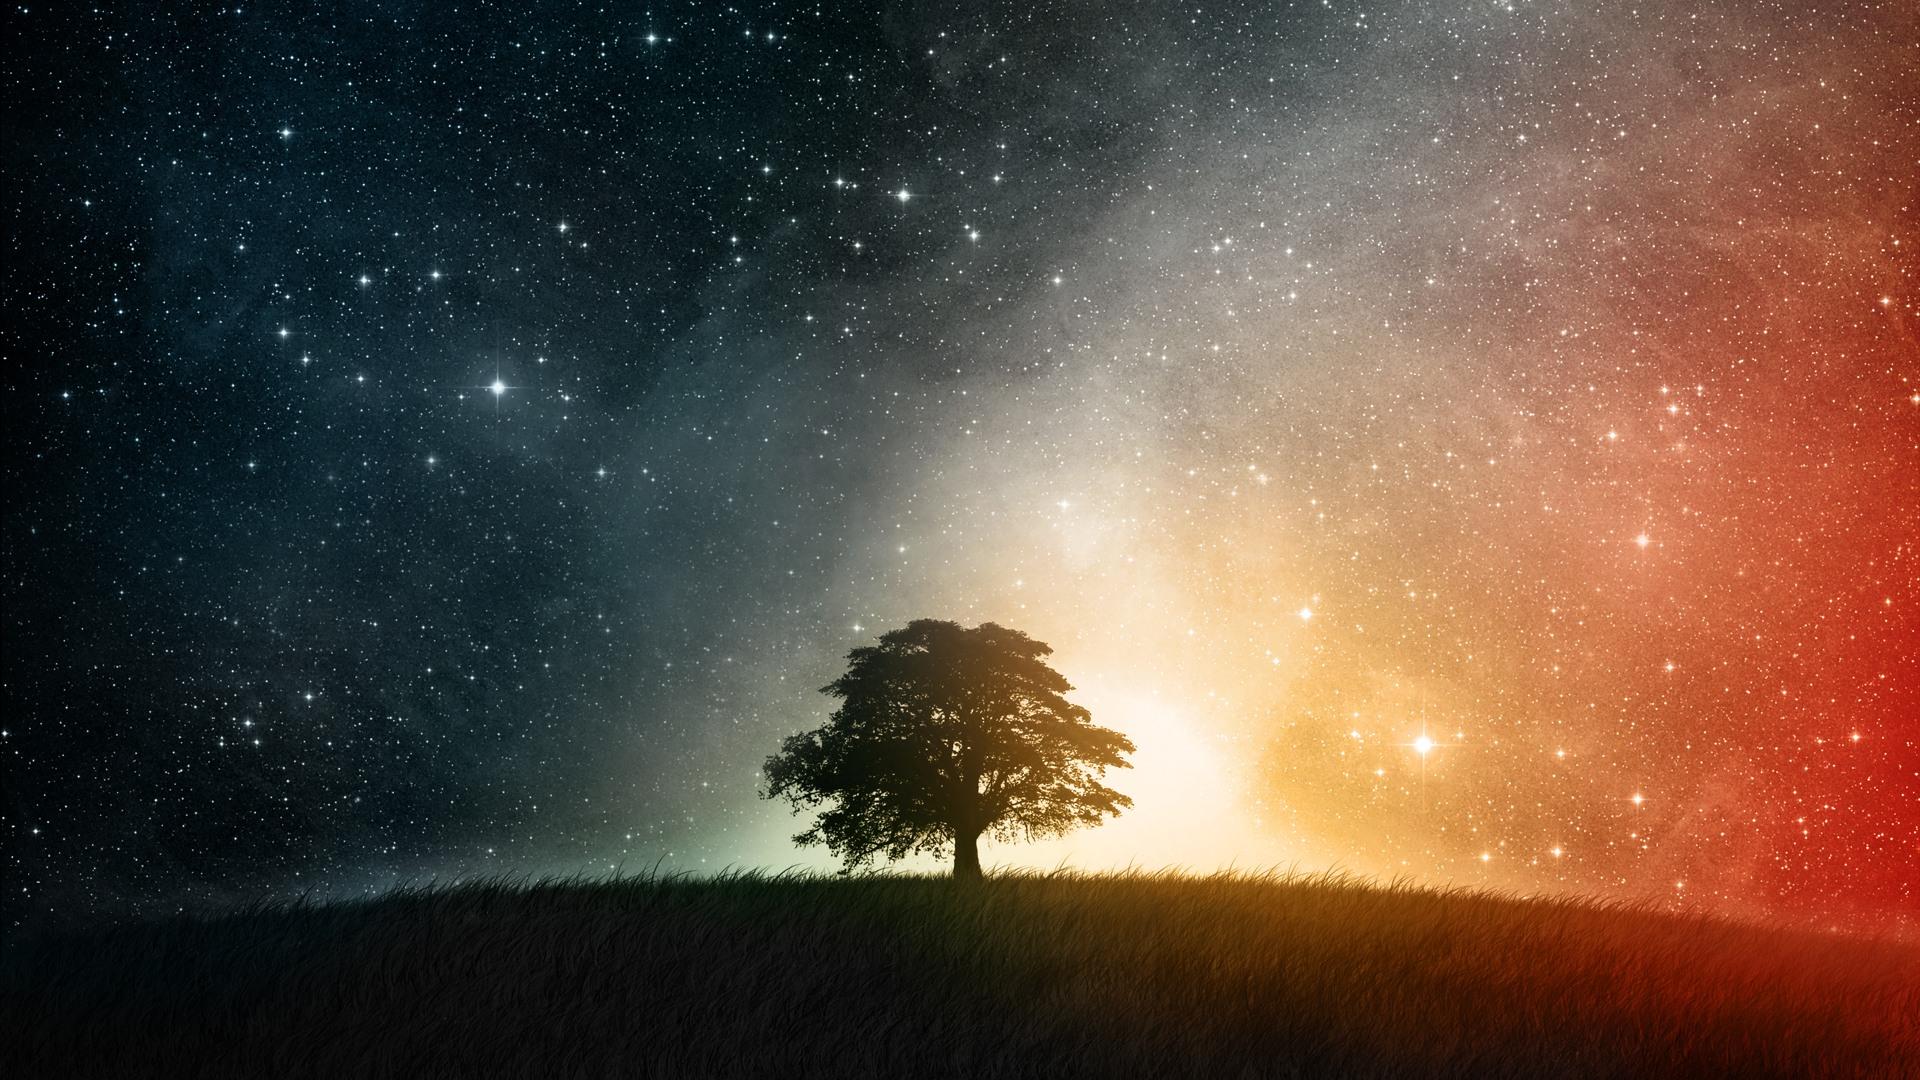 Galaxy on the Horizon desktop wallpaper 1920x1080